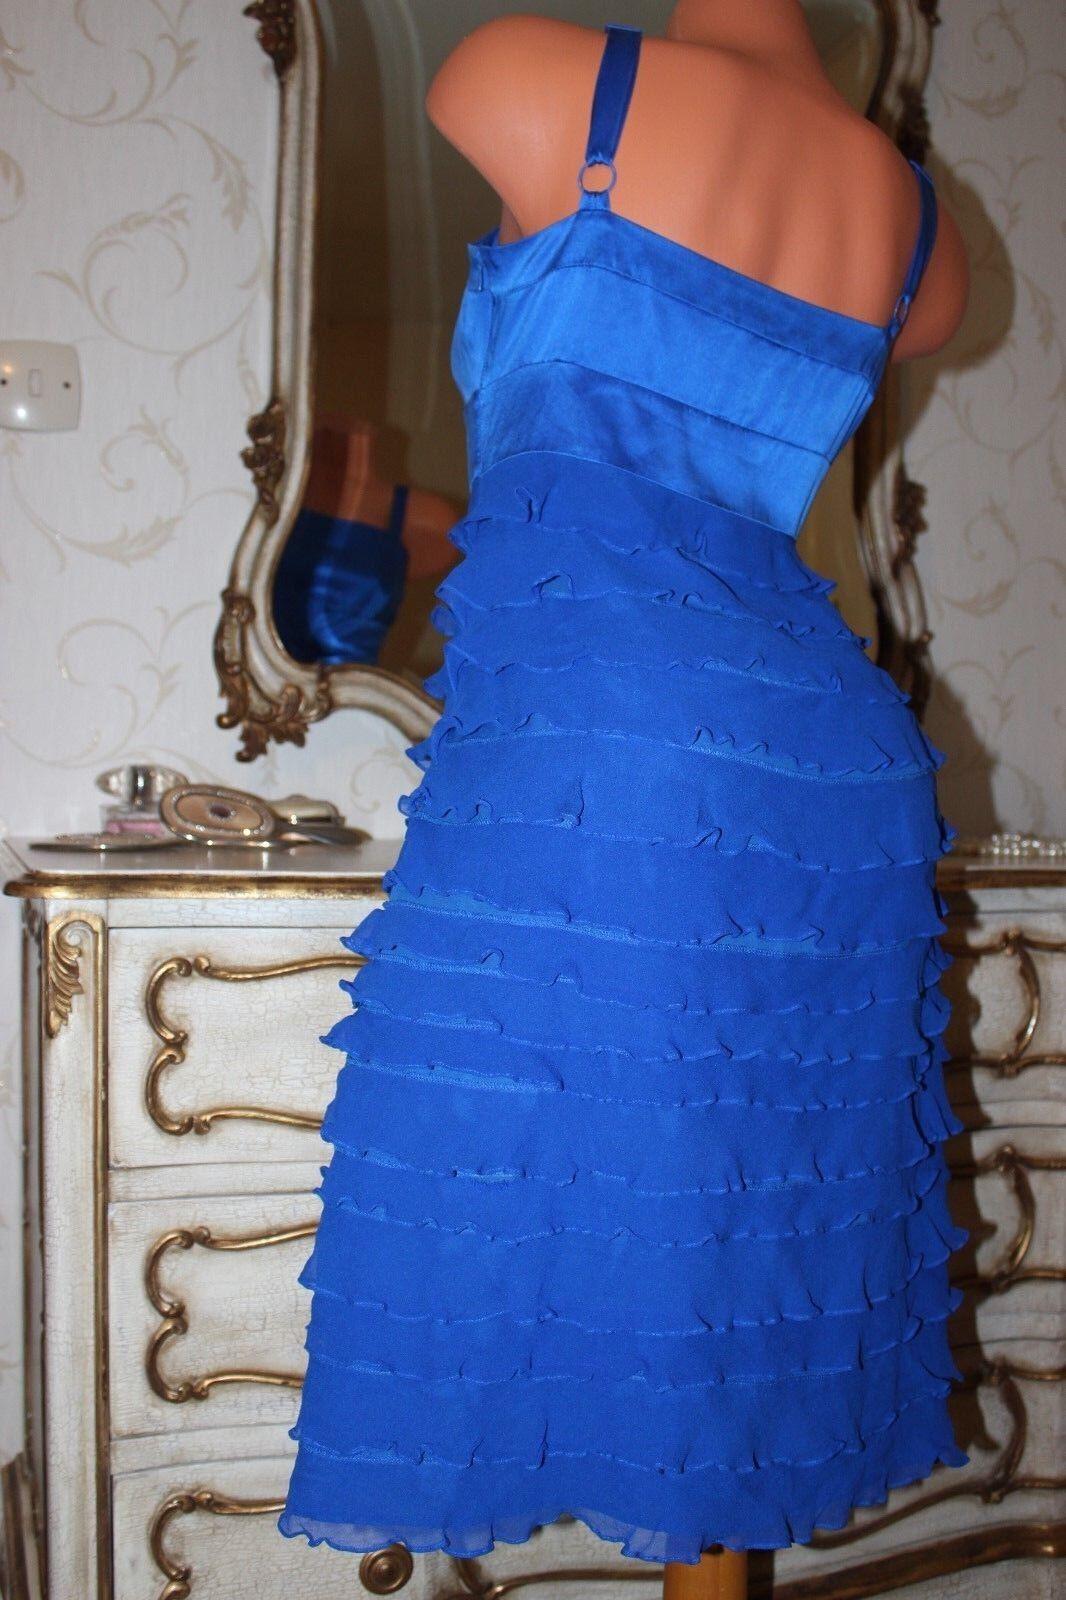 Monsoon Royal Blu 100% SETA SETA SETA donna aderente Frilly abito taglia 10 3ee84b